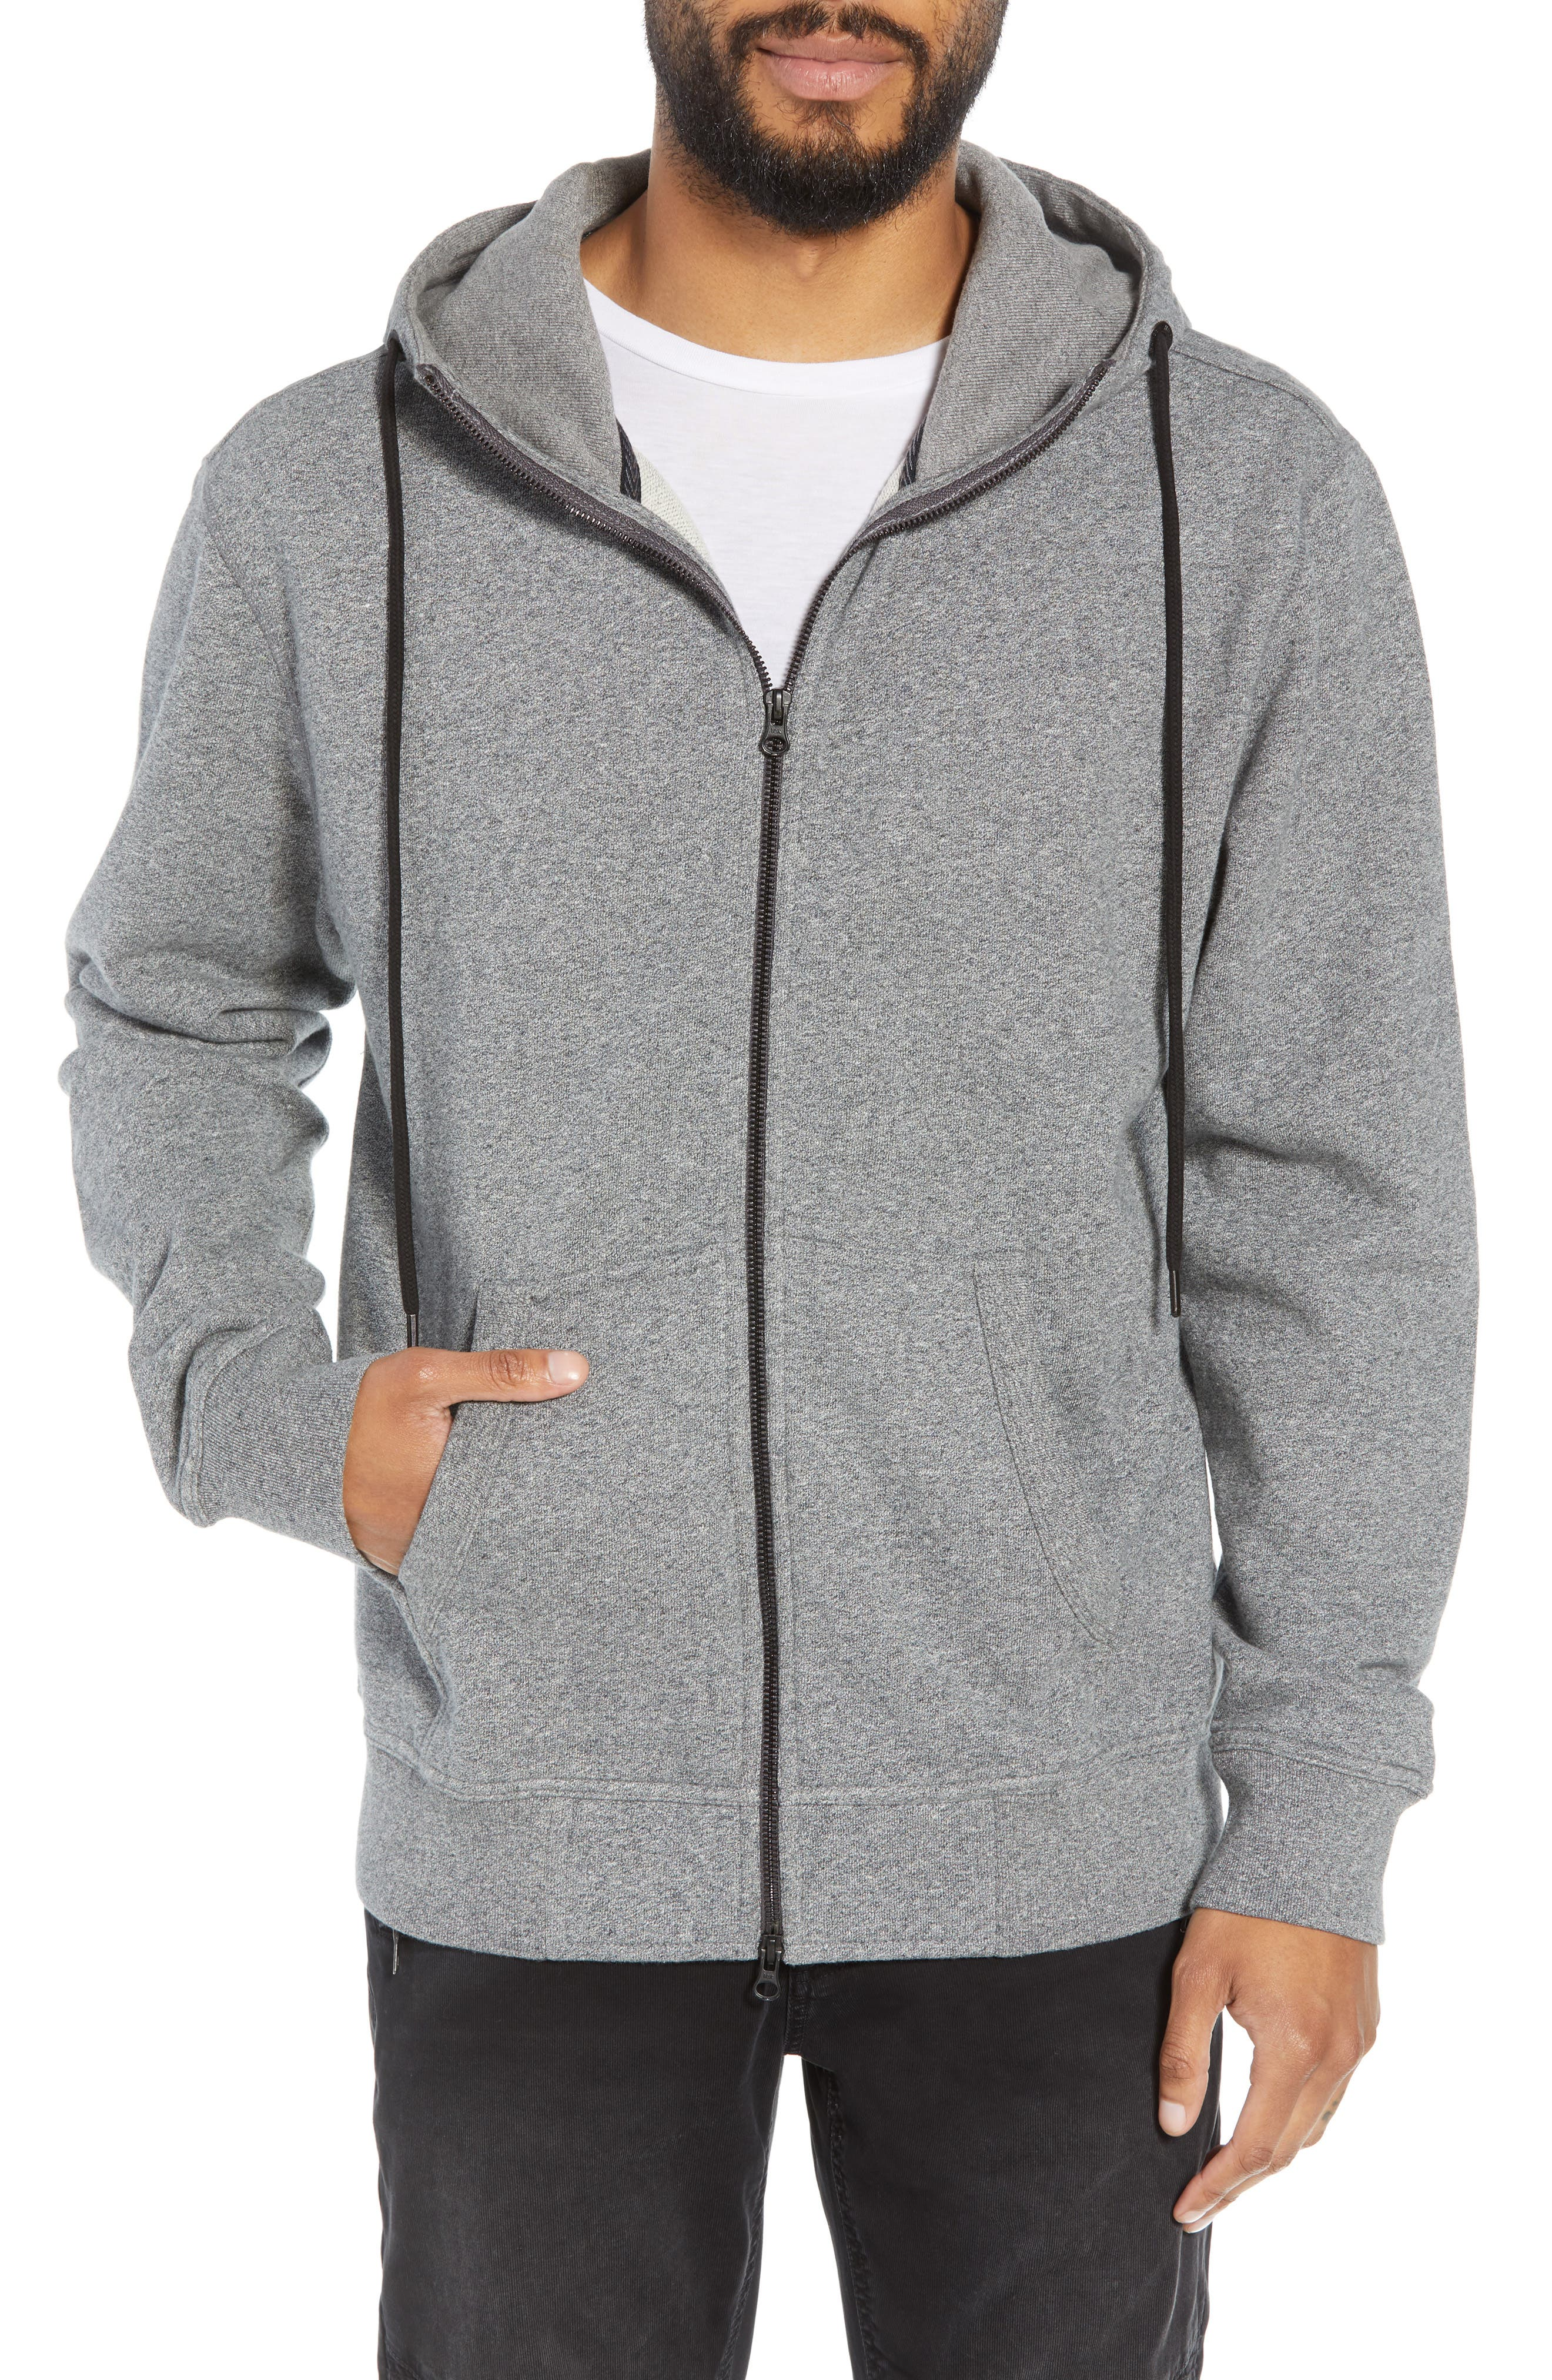 Regular Fit Hooded Zip Sweatshirt,                             Main thumbnail 1, color,                             HEATHER GREY